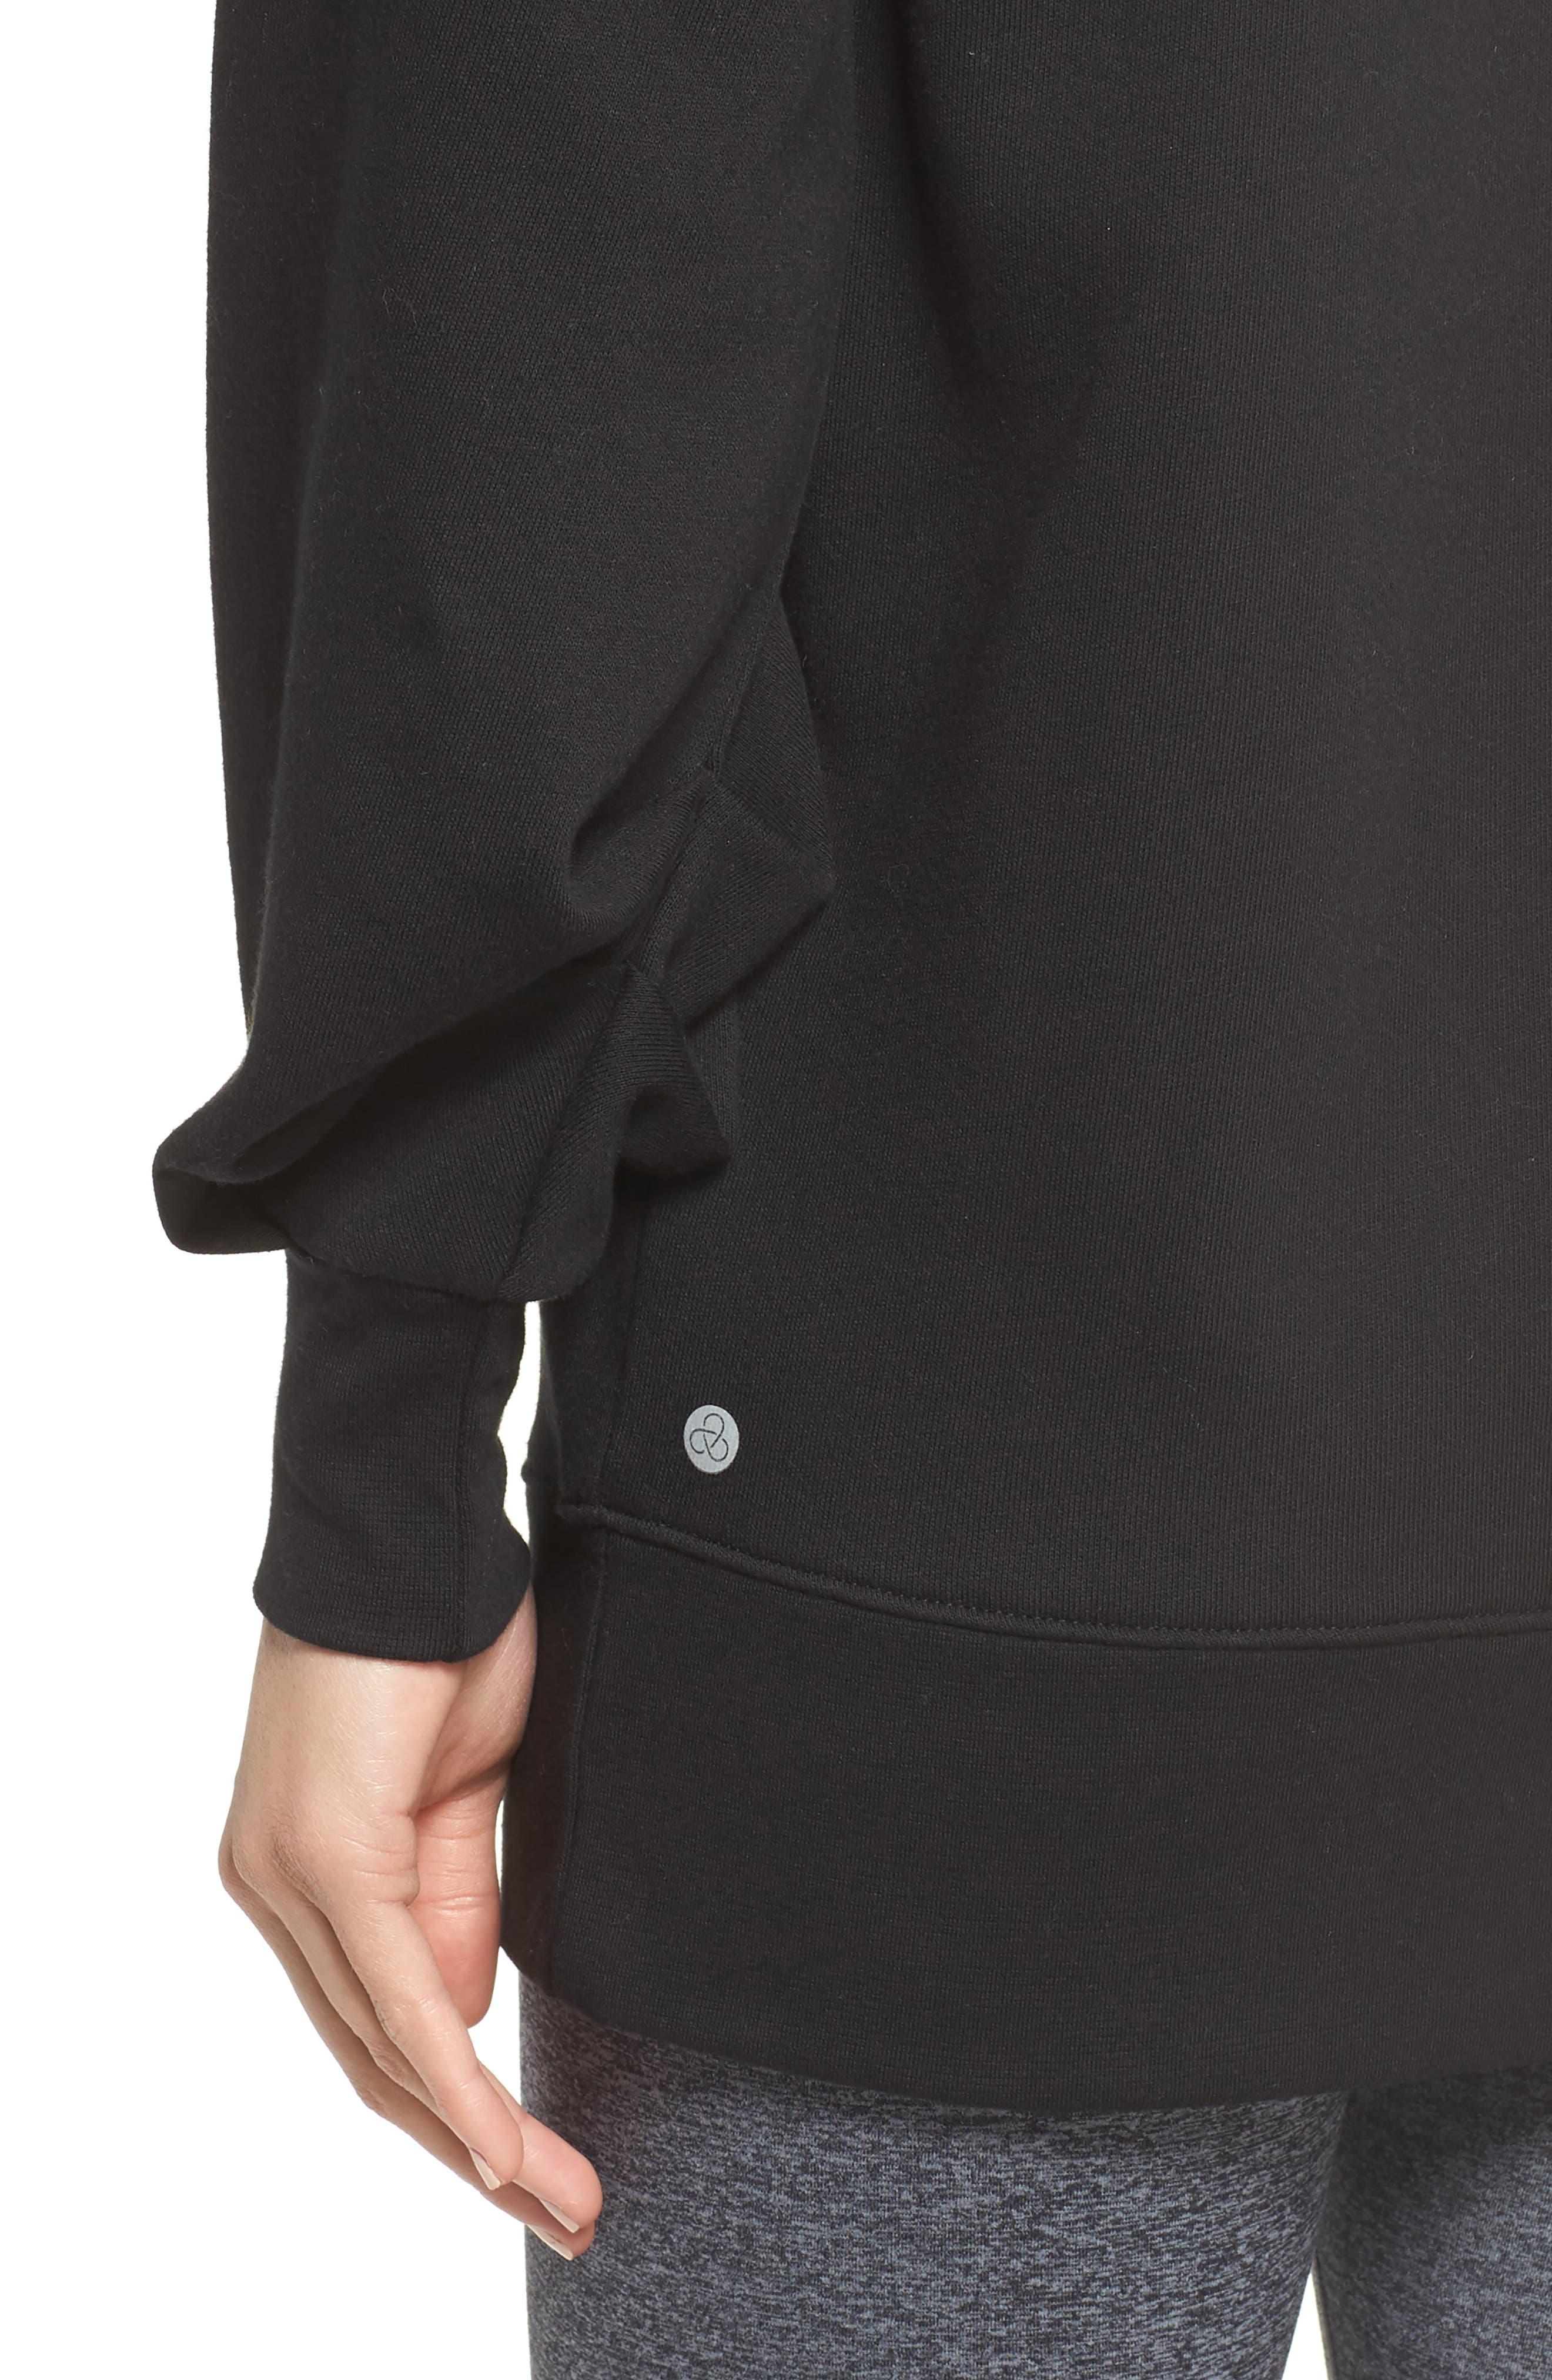 Boxy Oversize Sweatshirt,                             Alternate thumbnail 4, color,                             Black